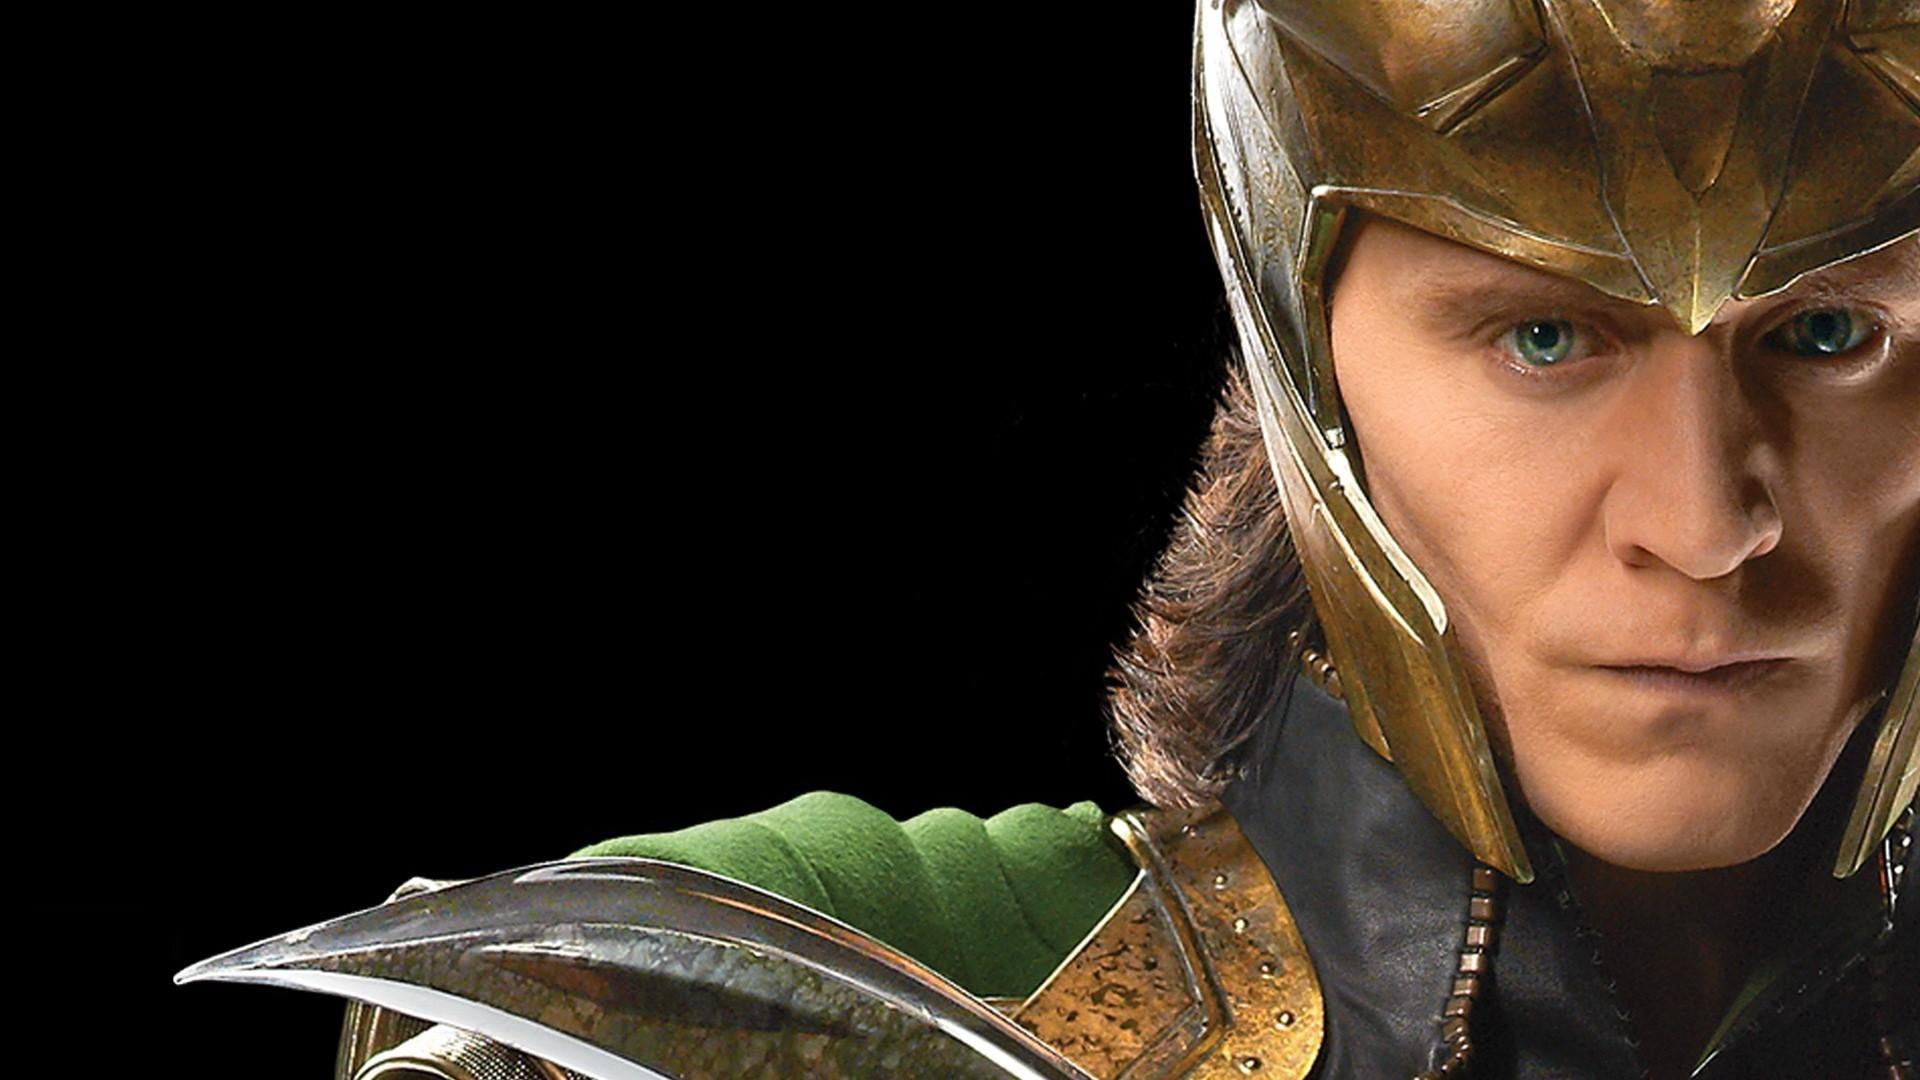 Loki Tom Wallpaper 1920x1080 Loki Tom Hiddleston The Avengers 1920x1080